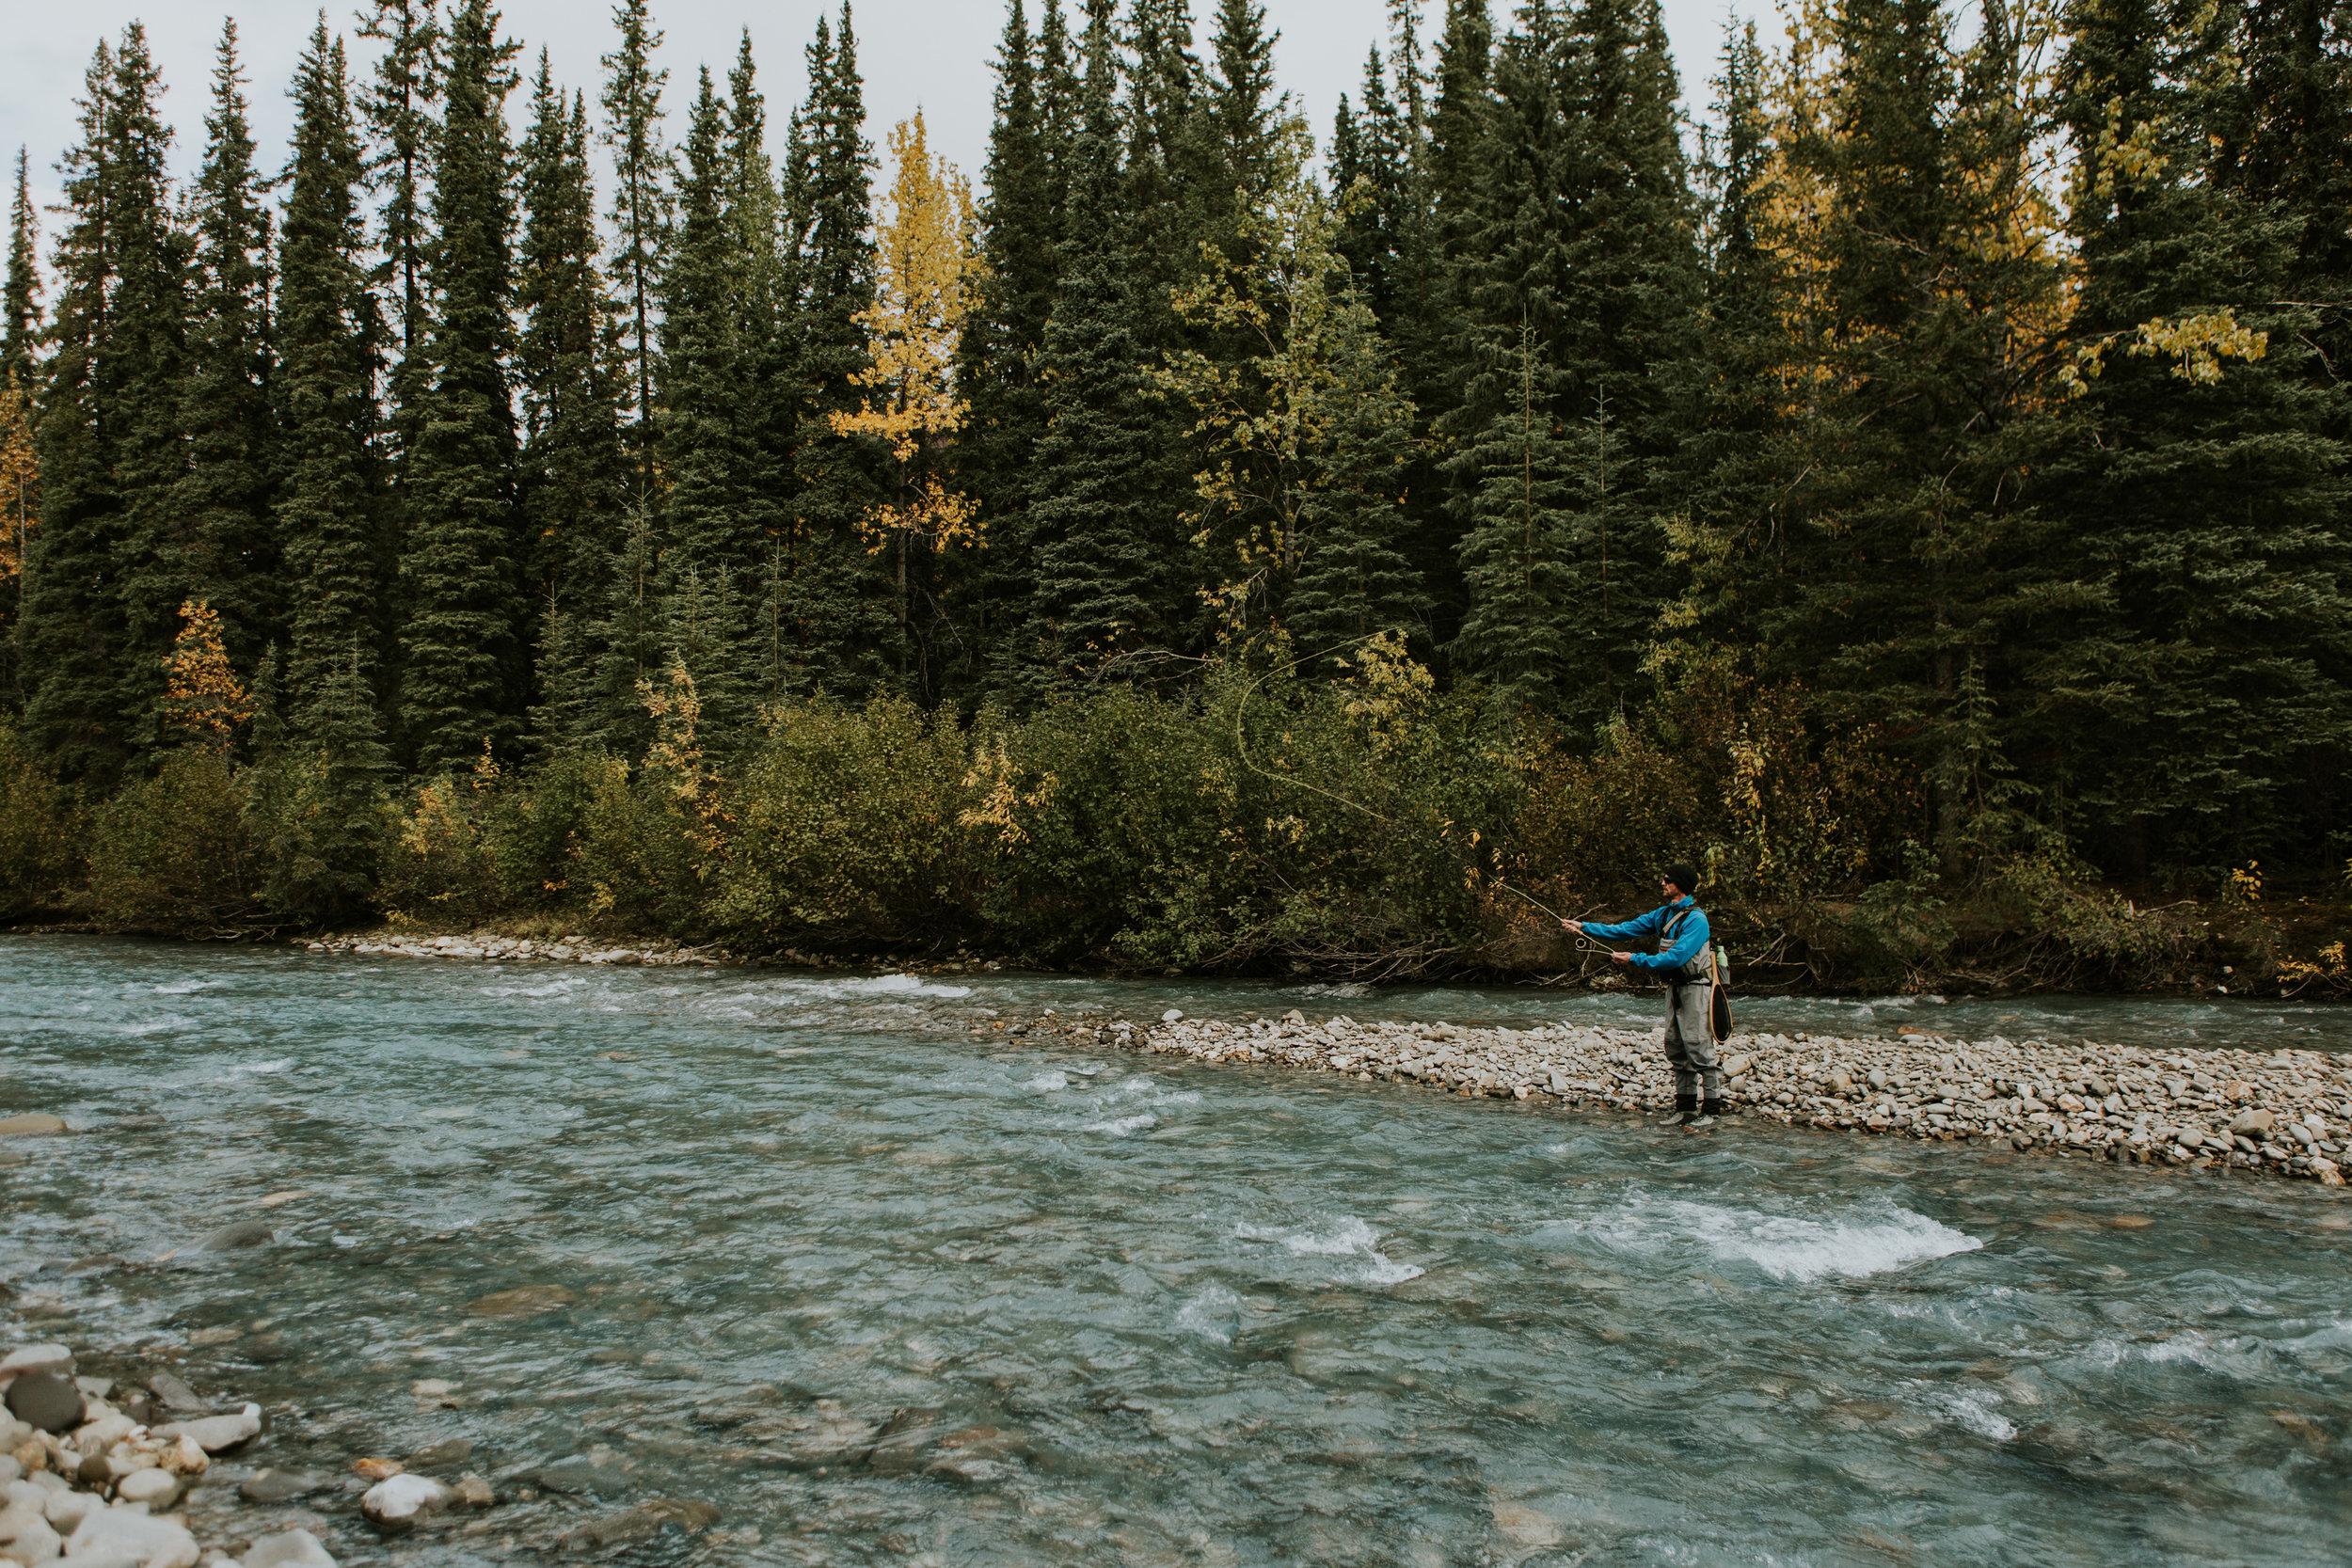 CindyGiovagnoli_Alaska_KoyukukRiver_SukakpakMountain_JimRiver_ArcticCircle_fly_fishing_September-052.jpg